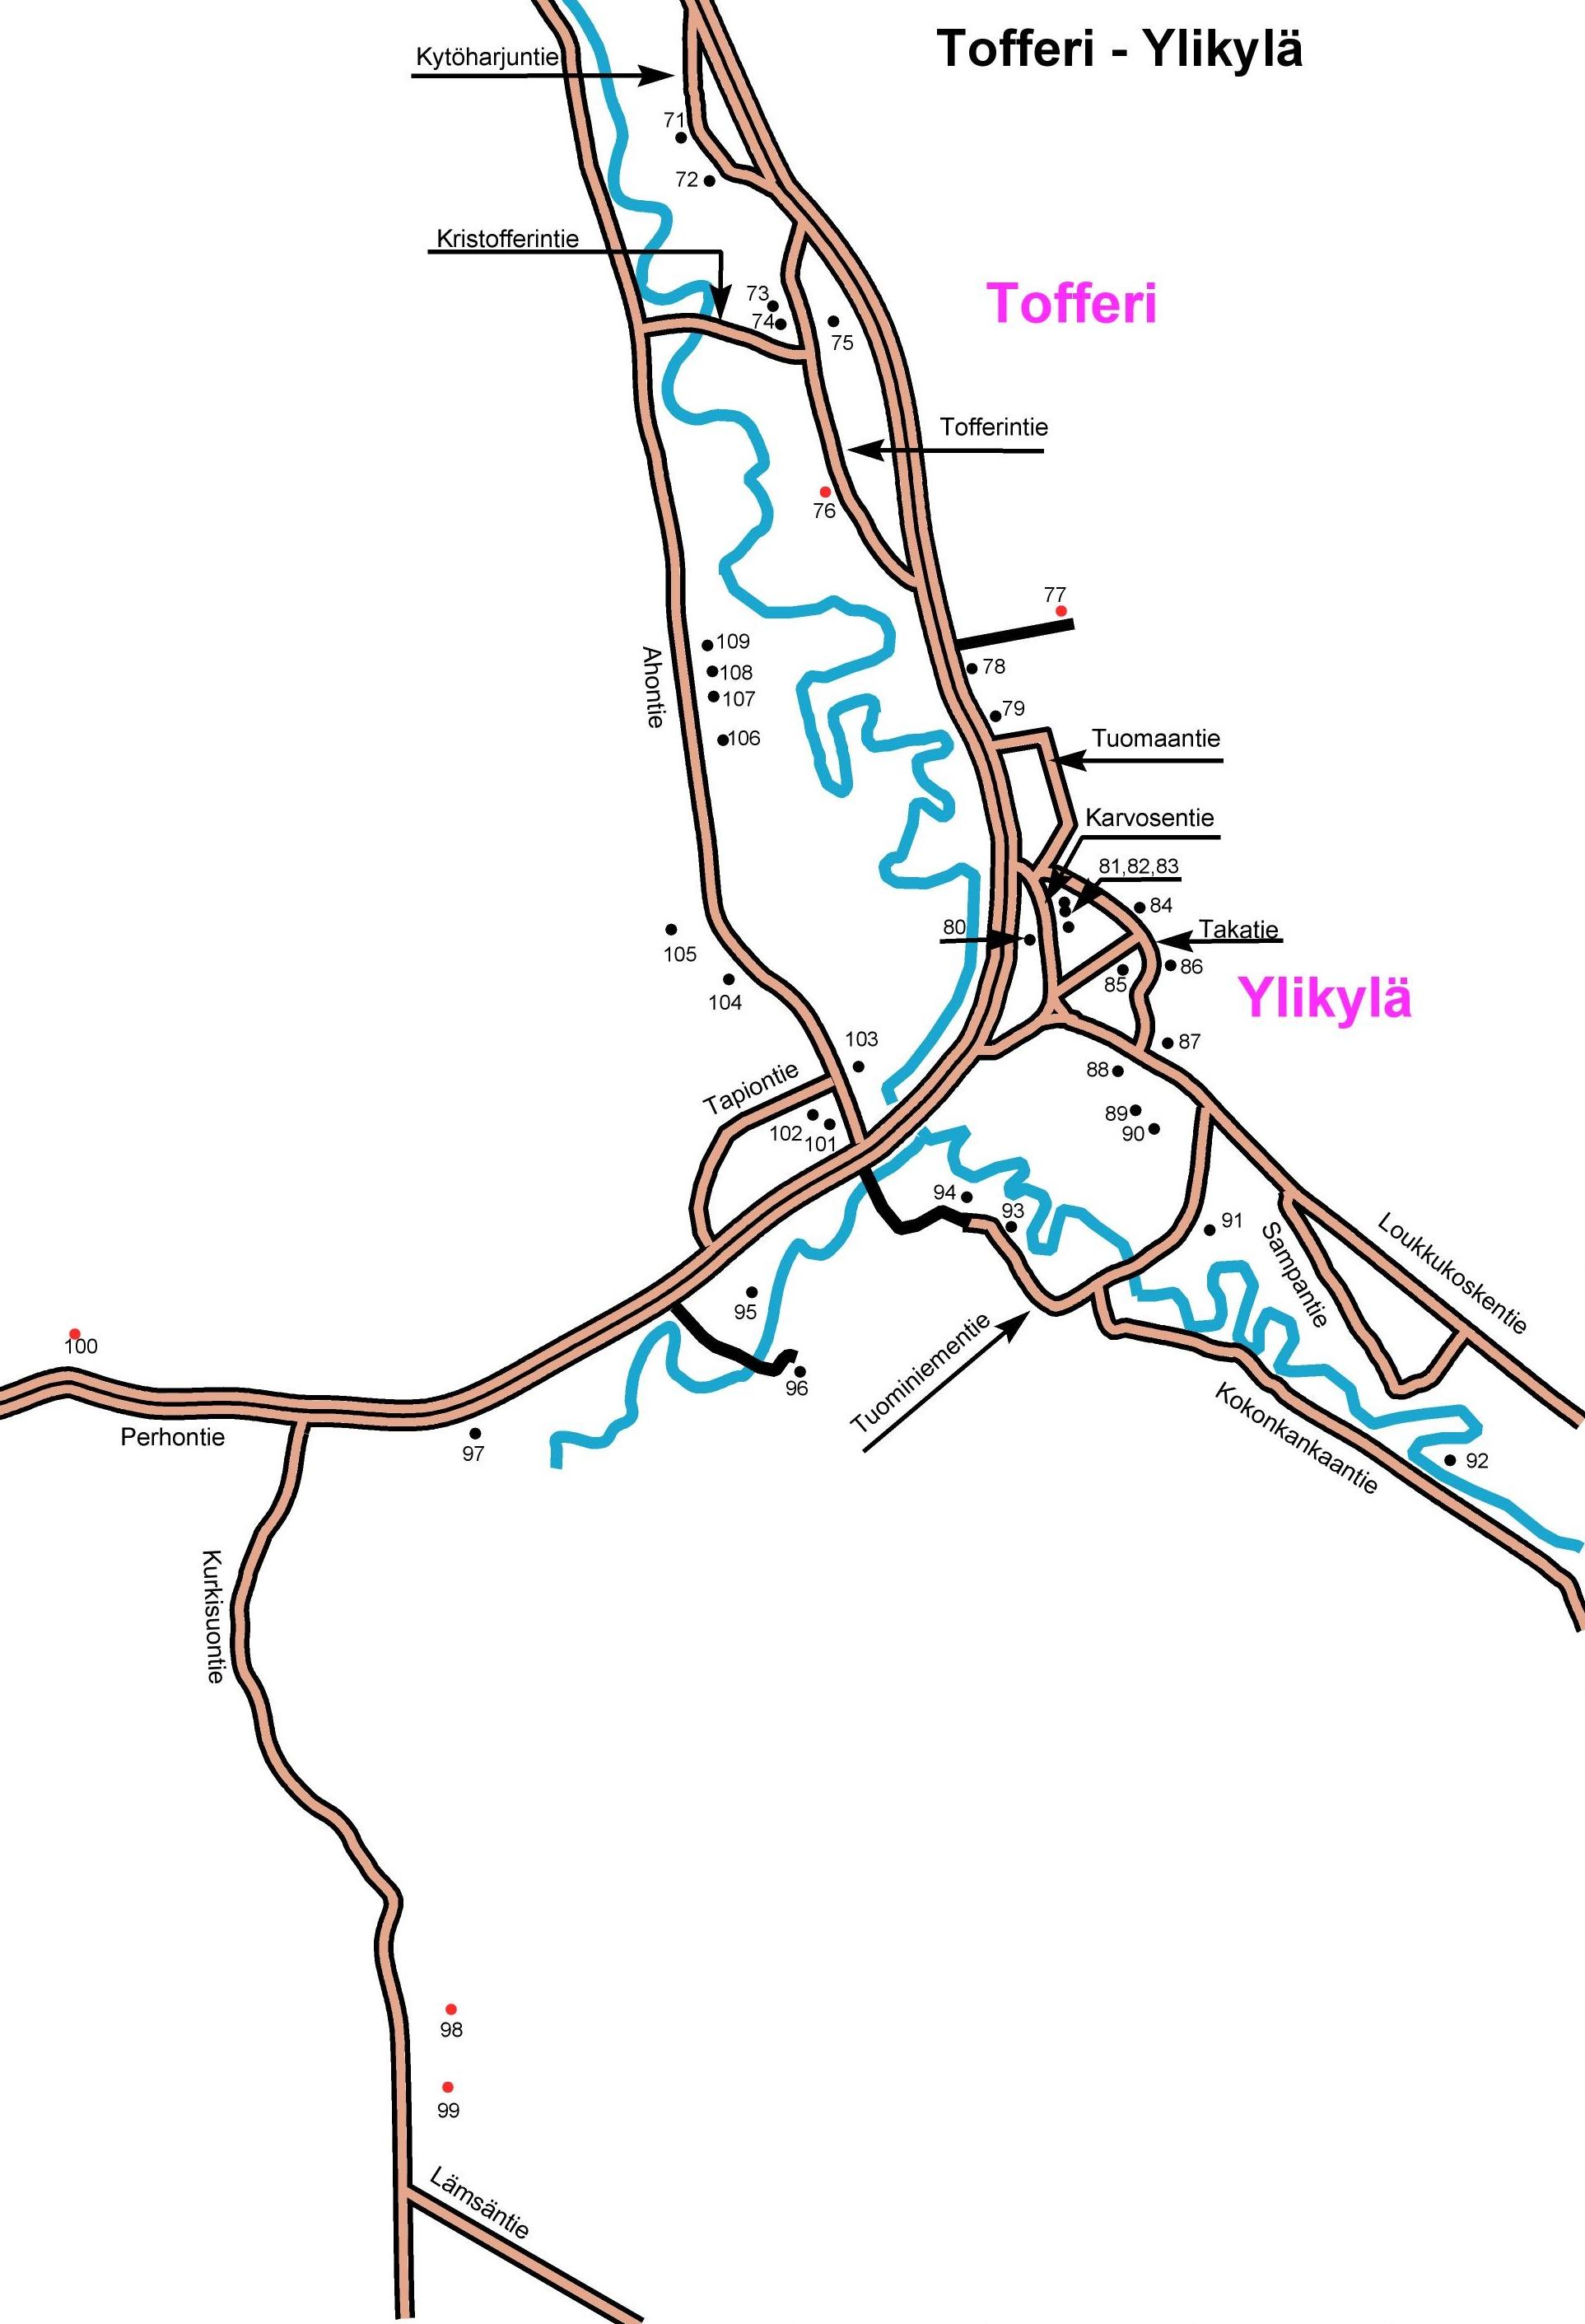 Ylikylän kartta